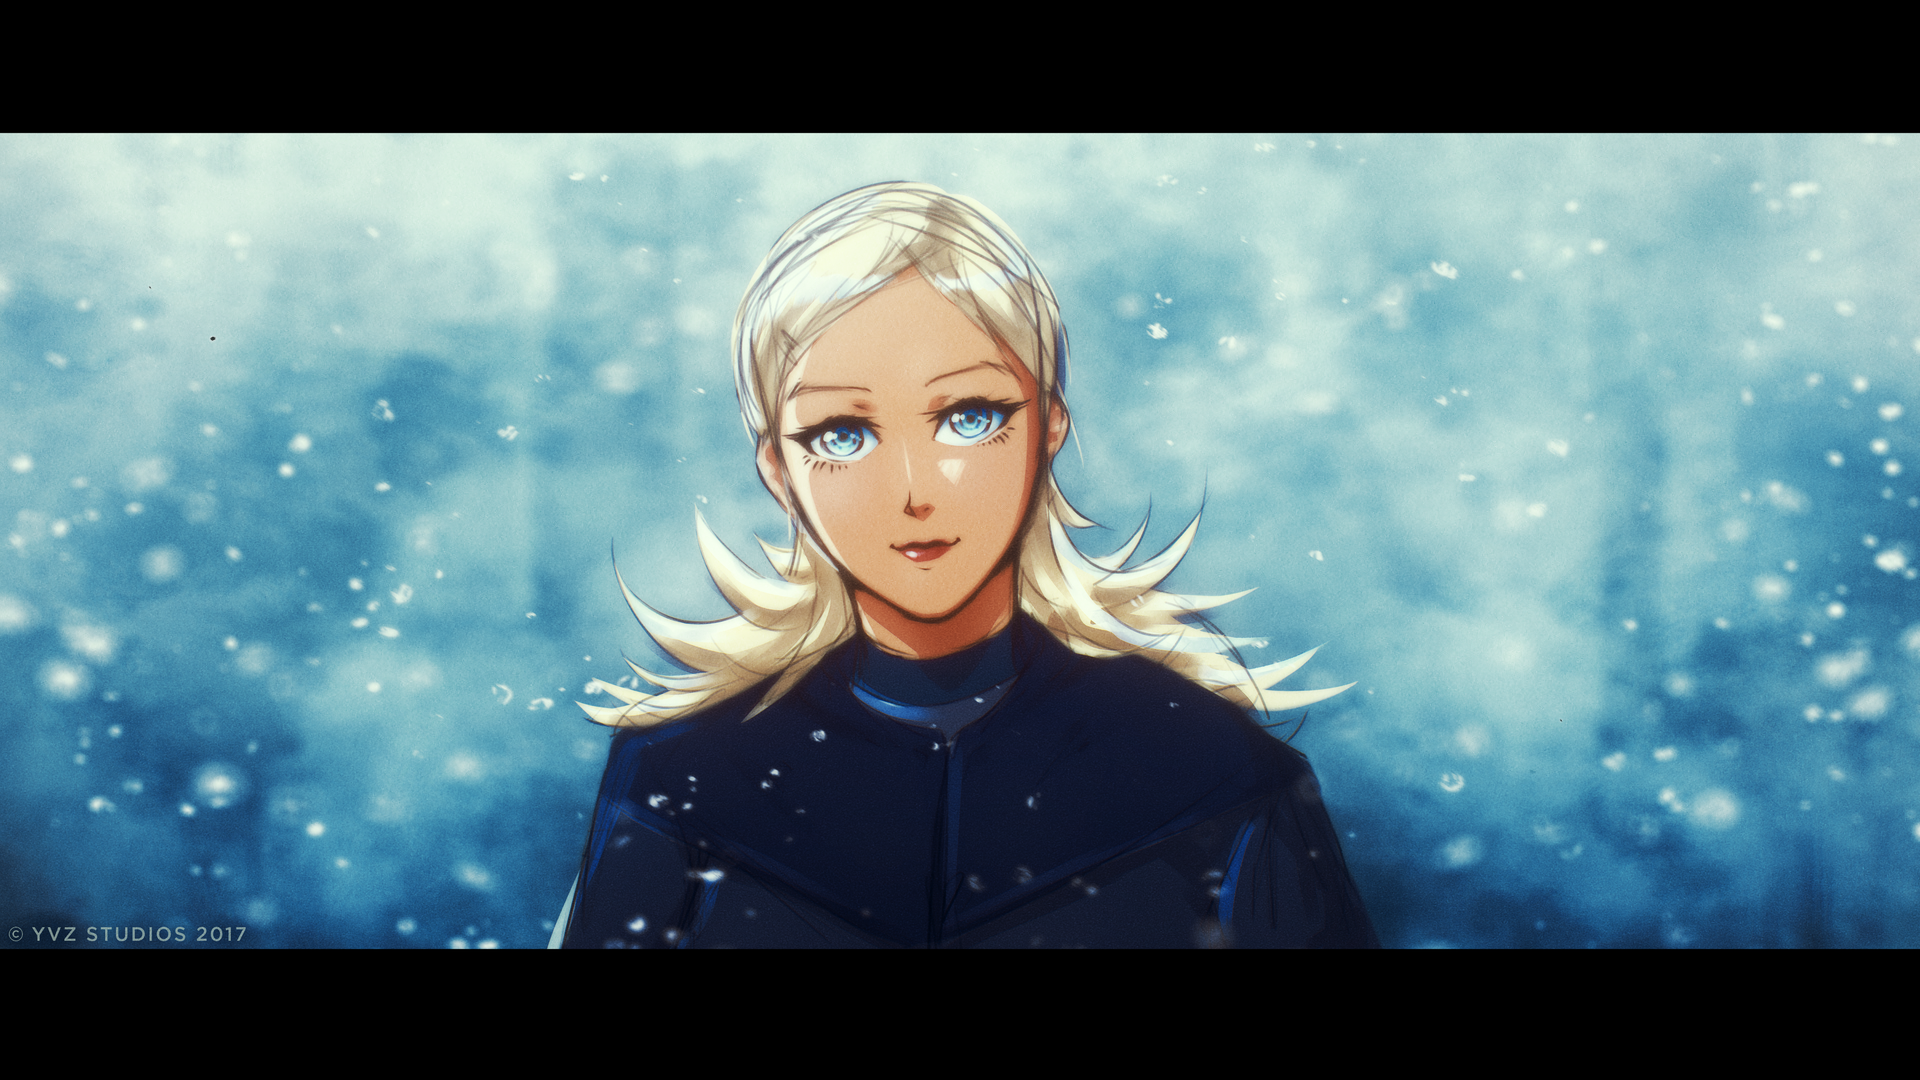 Snowy Witch with blue eyes - Cinematic by Gubnub